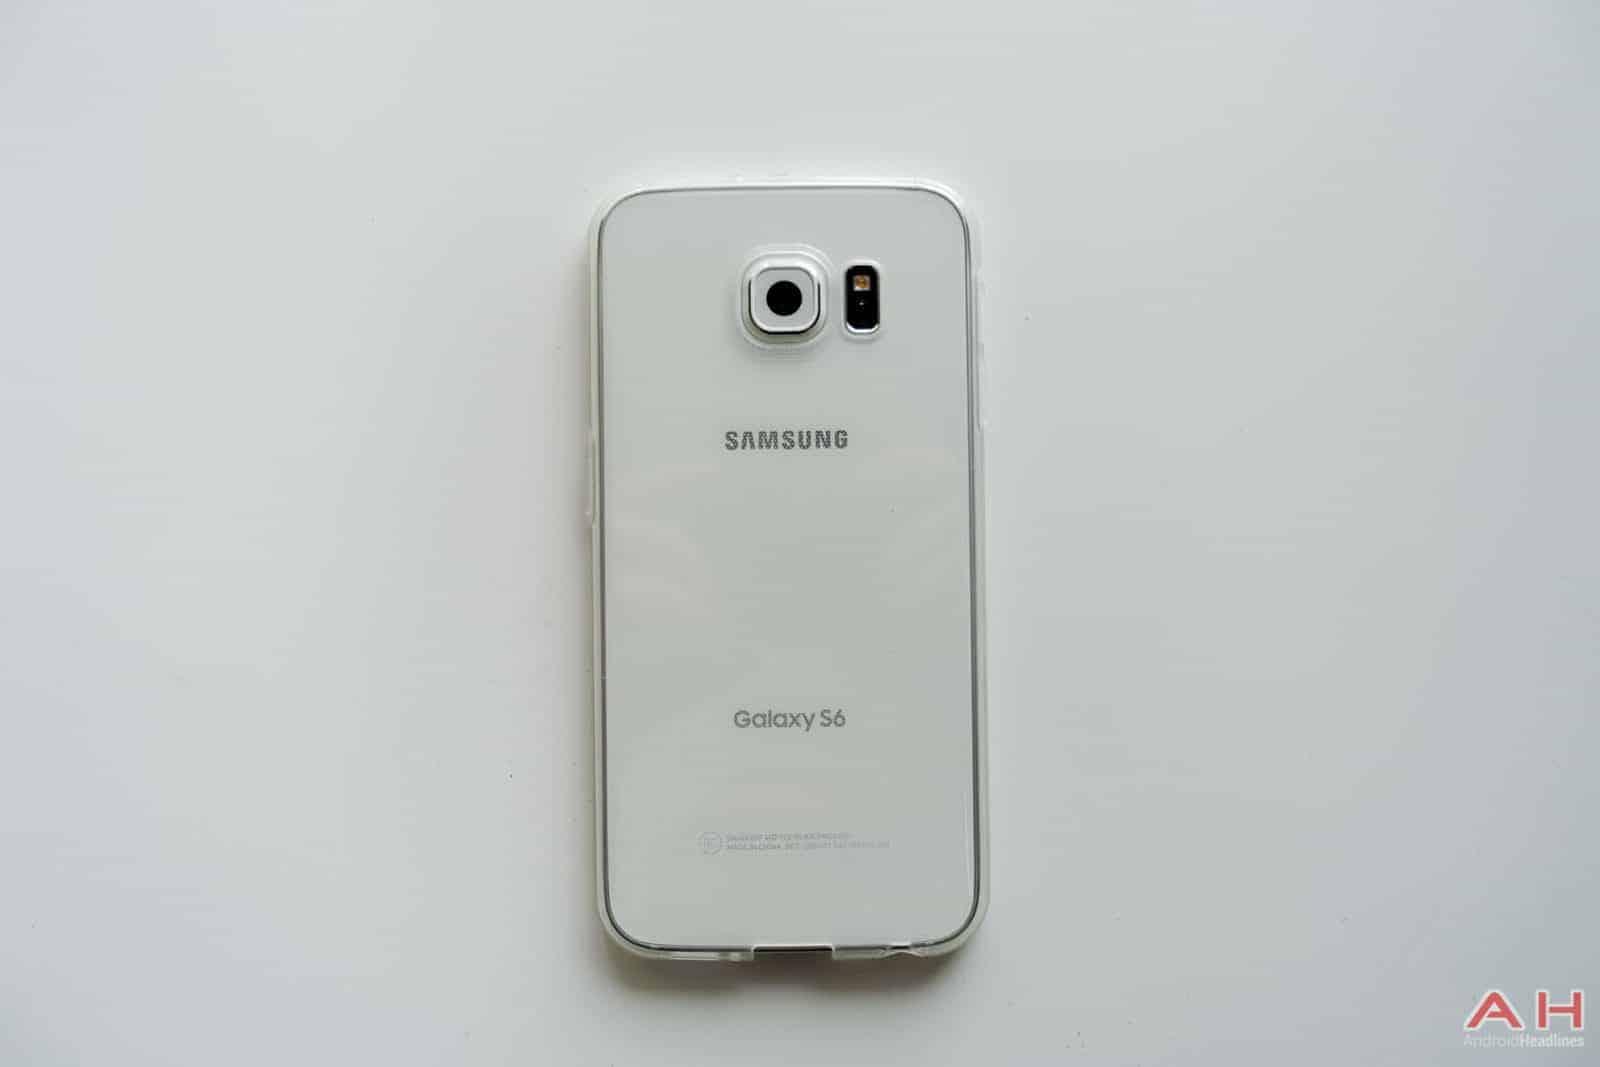 Samsung-Galaxy-S6-Verus-Crystal-Light-Case-AH-1